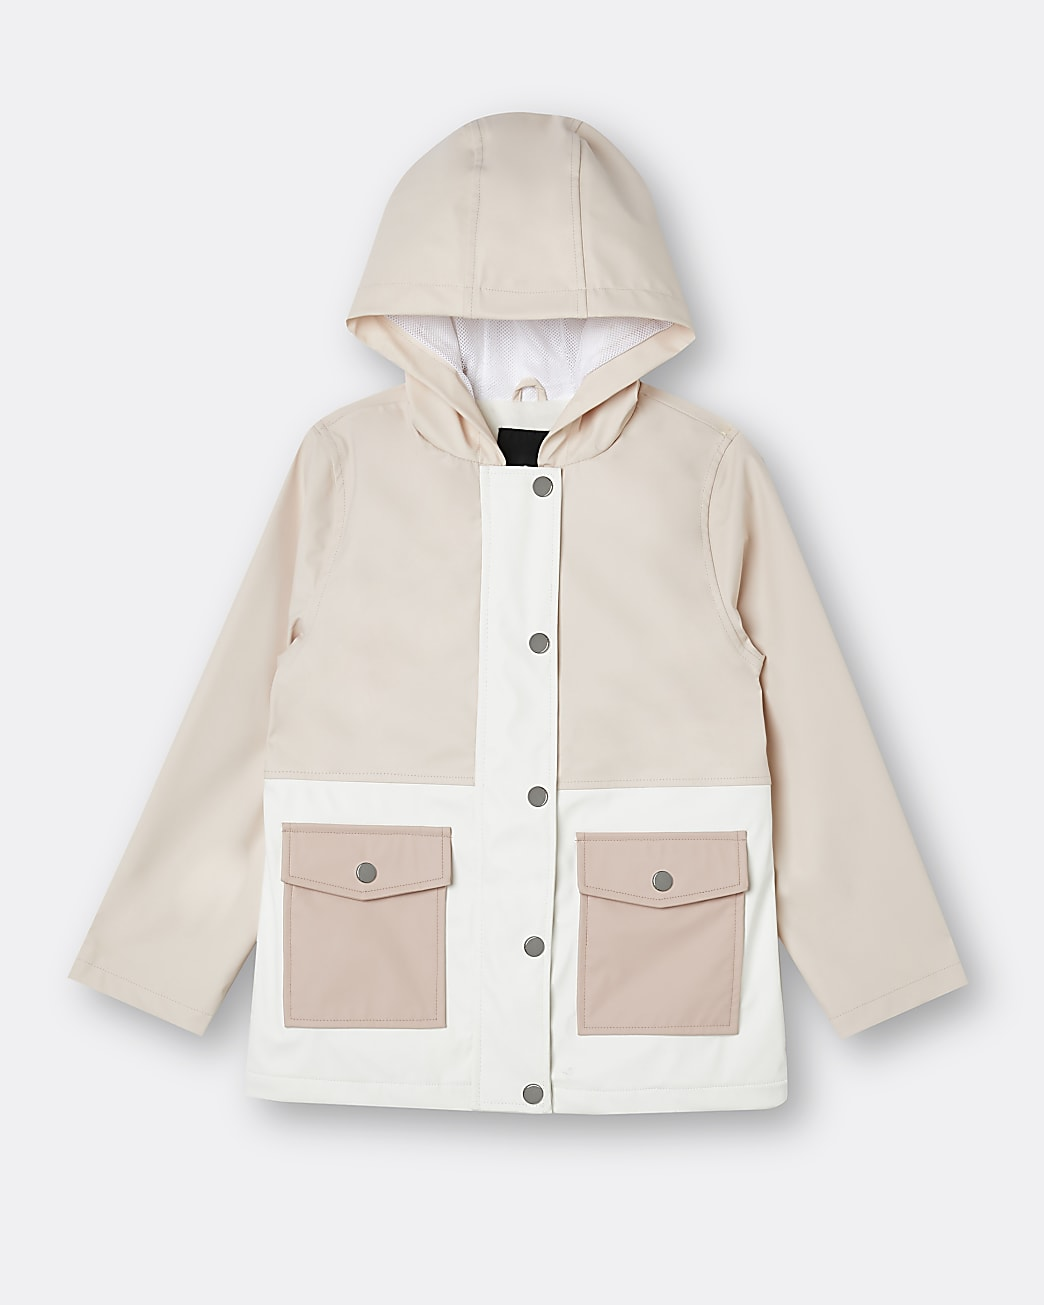 Girls pink shower resistant rain jacket